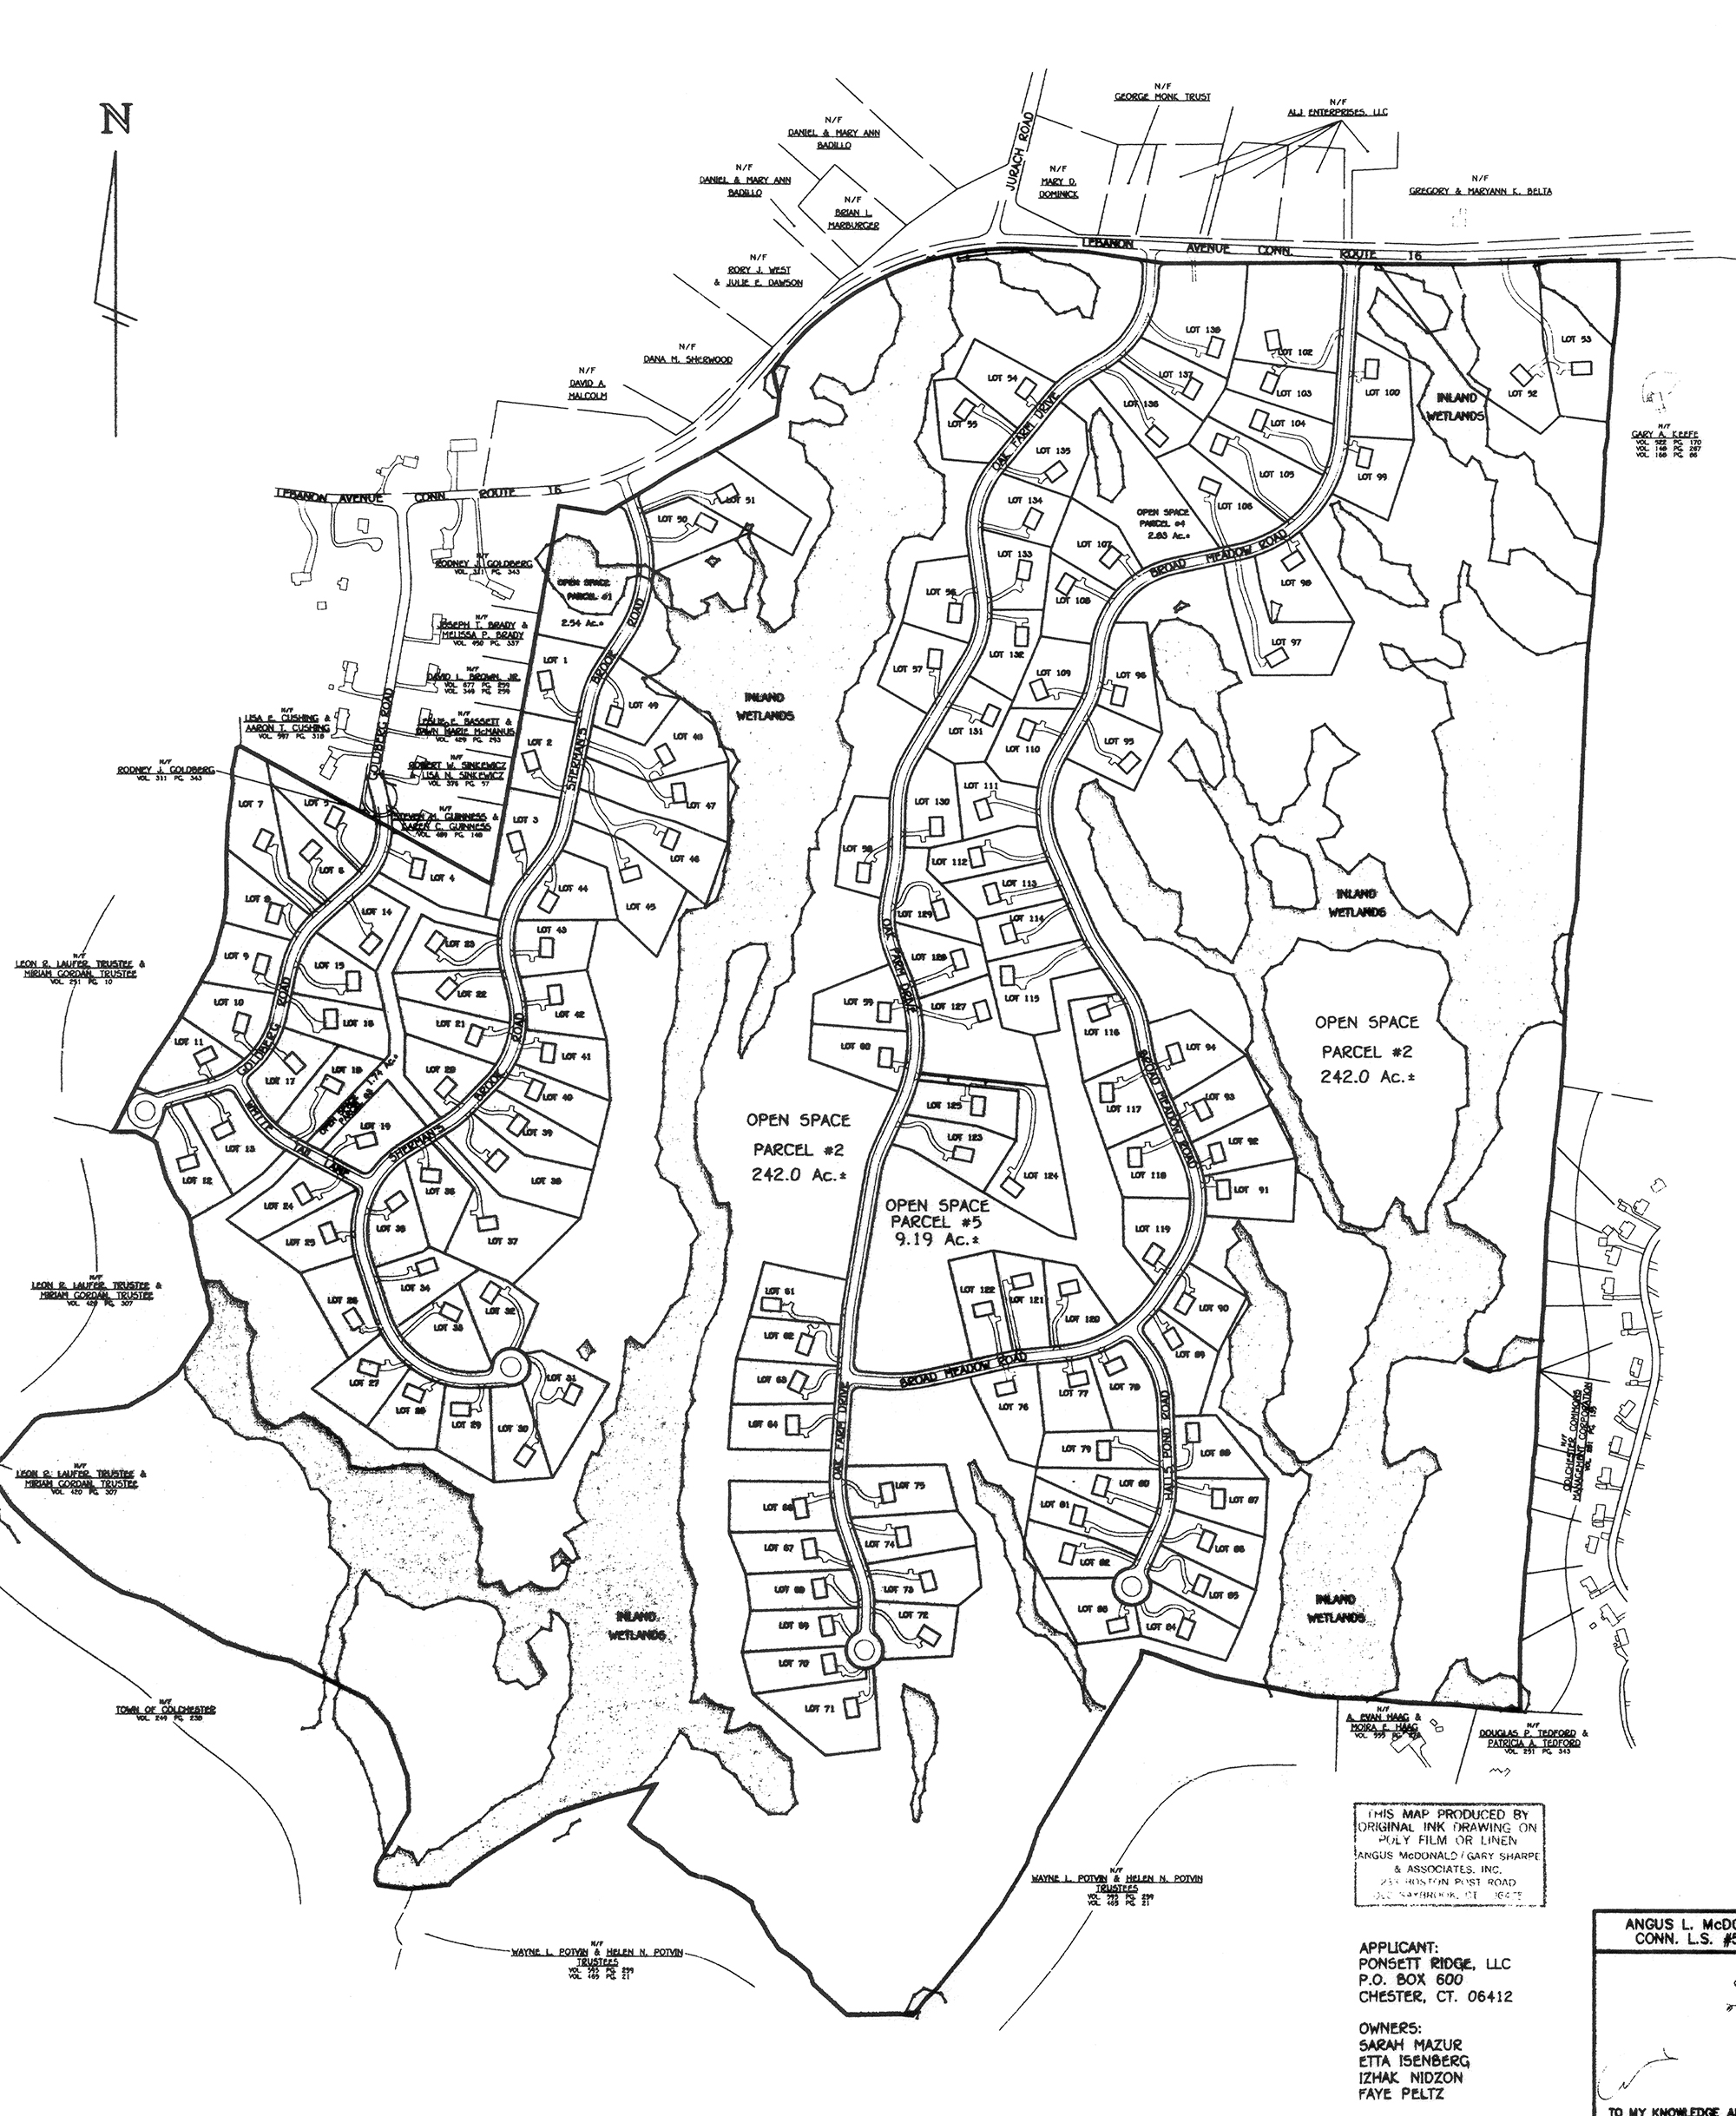 2000x2438 Site Plan Gavire Amp Goldberg Estates